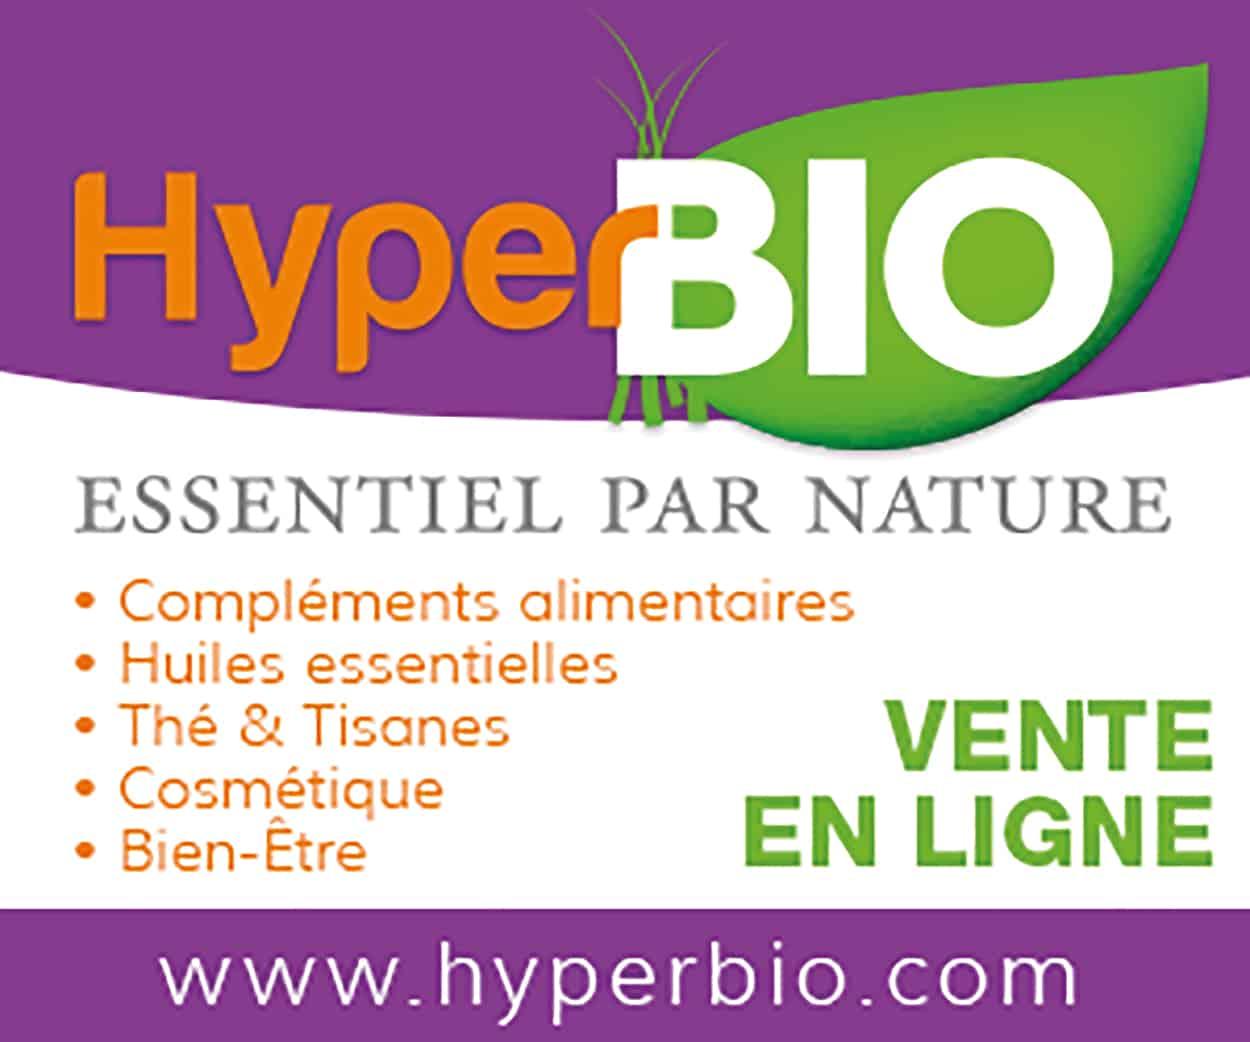 Hyper Bio